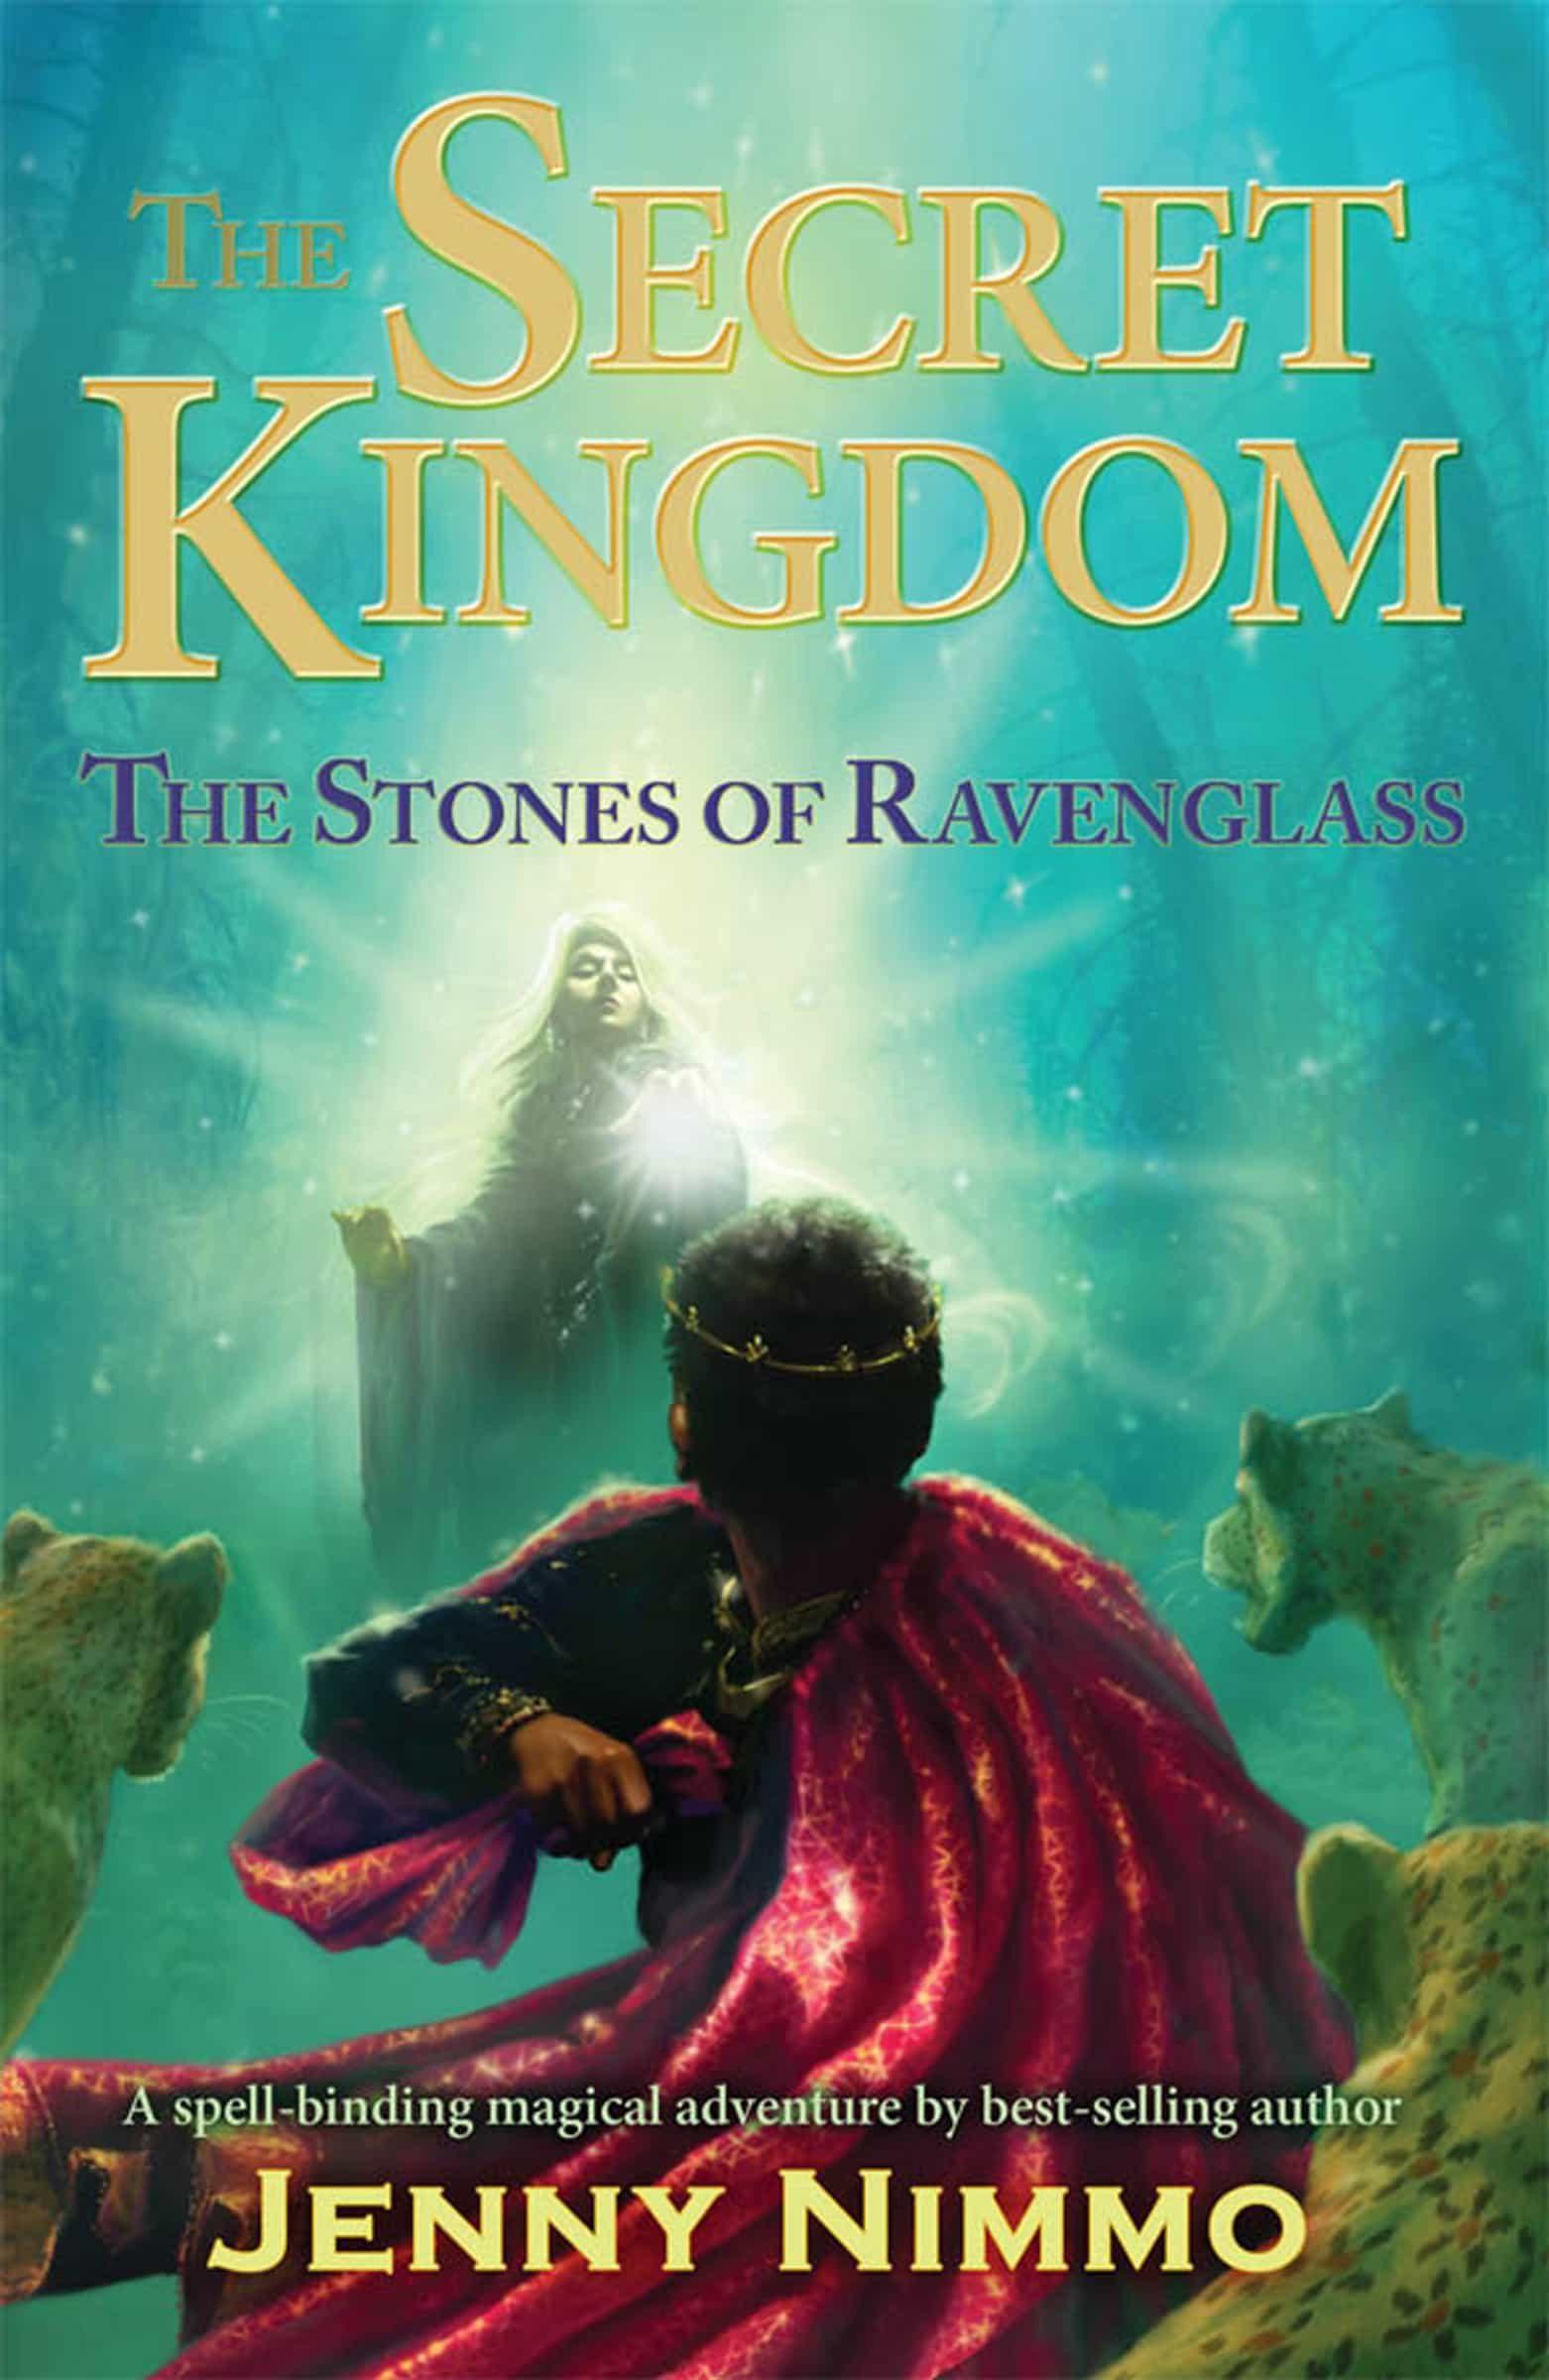 The Secret Kingdom: Stones Of Ravenglass (ebook)jenny Nimmo9781780311869